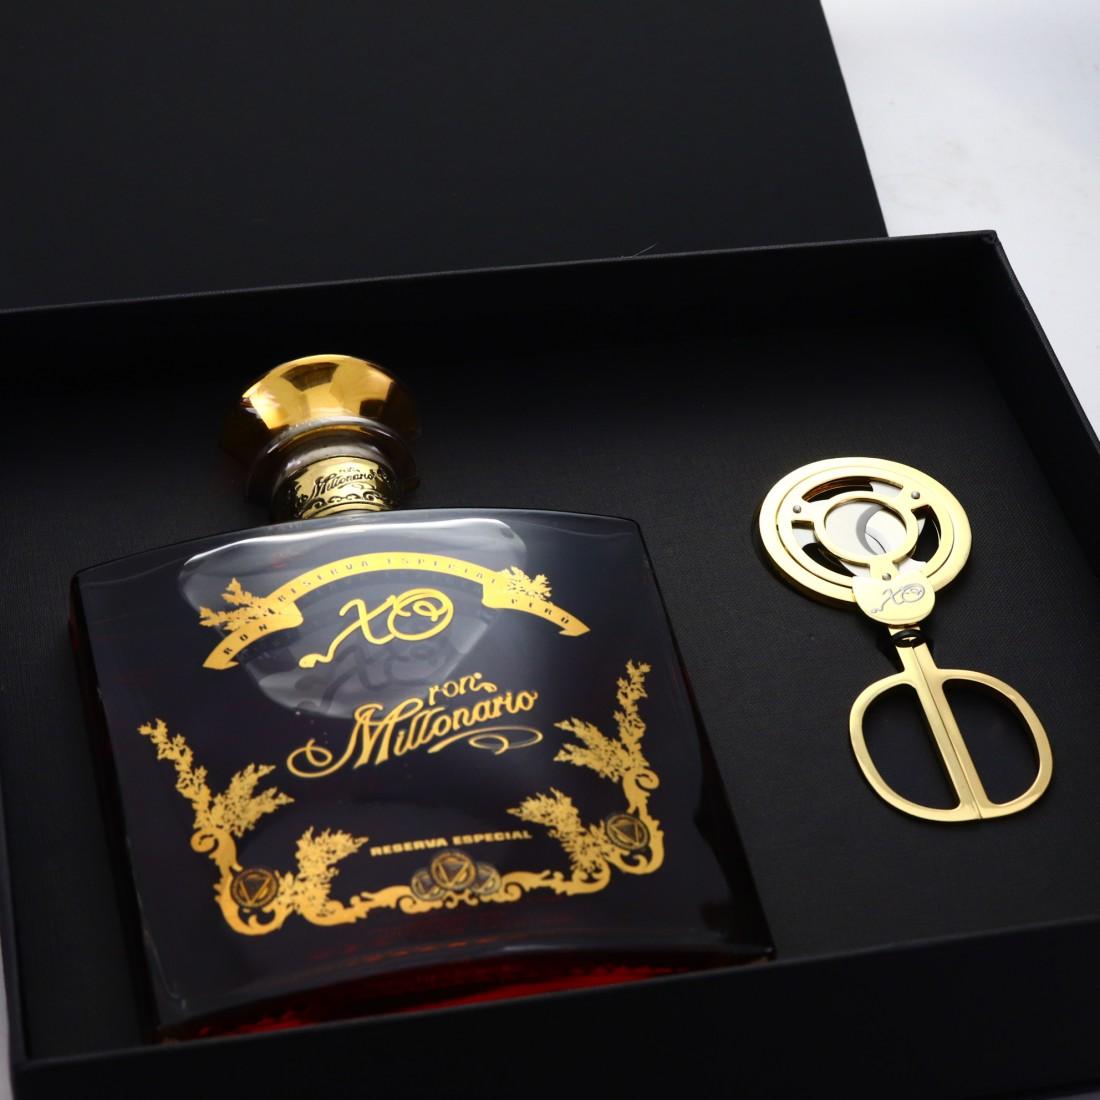 Ron Millonario XO Reserva Especial Special Edition